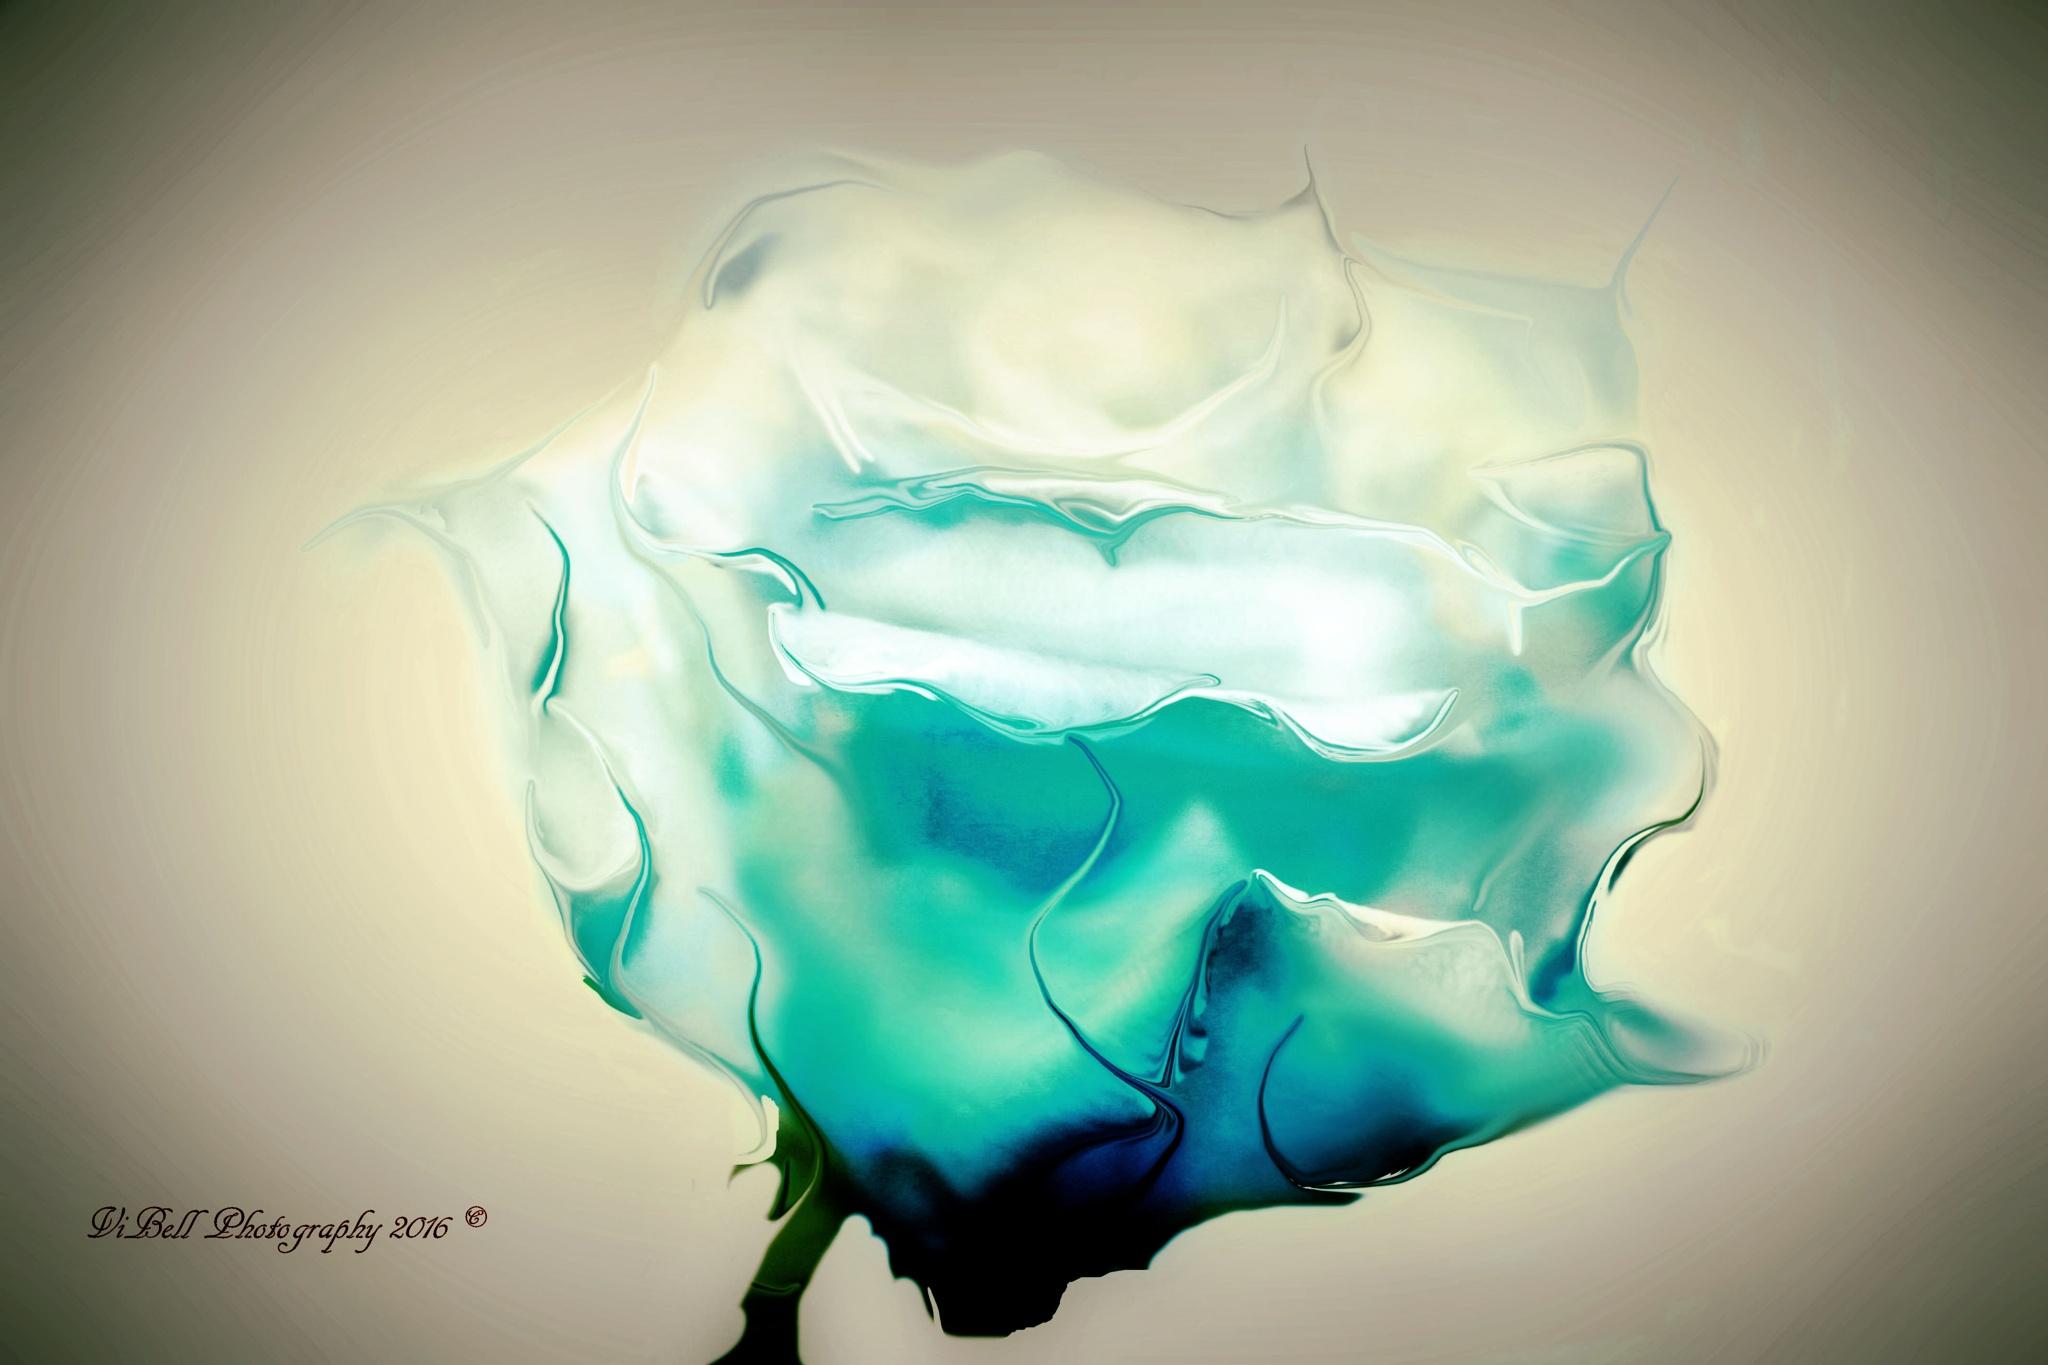 Untitled by Vibellflower